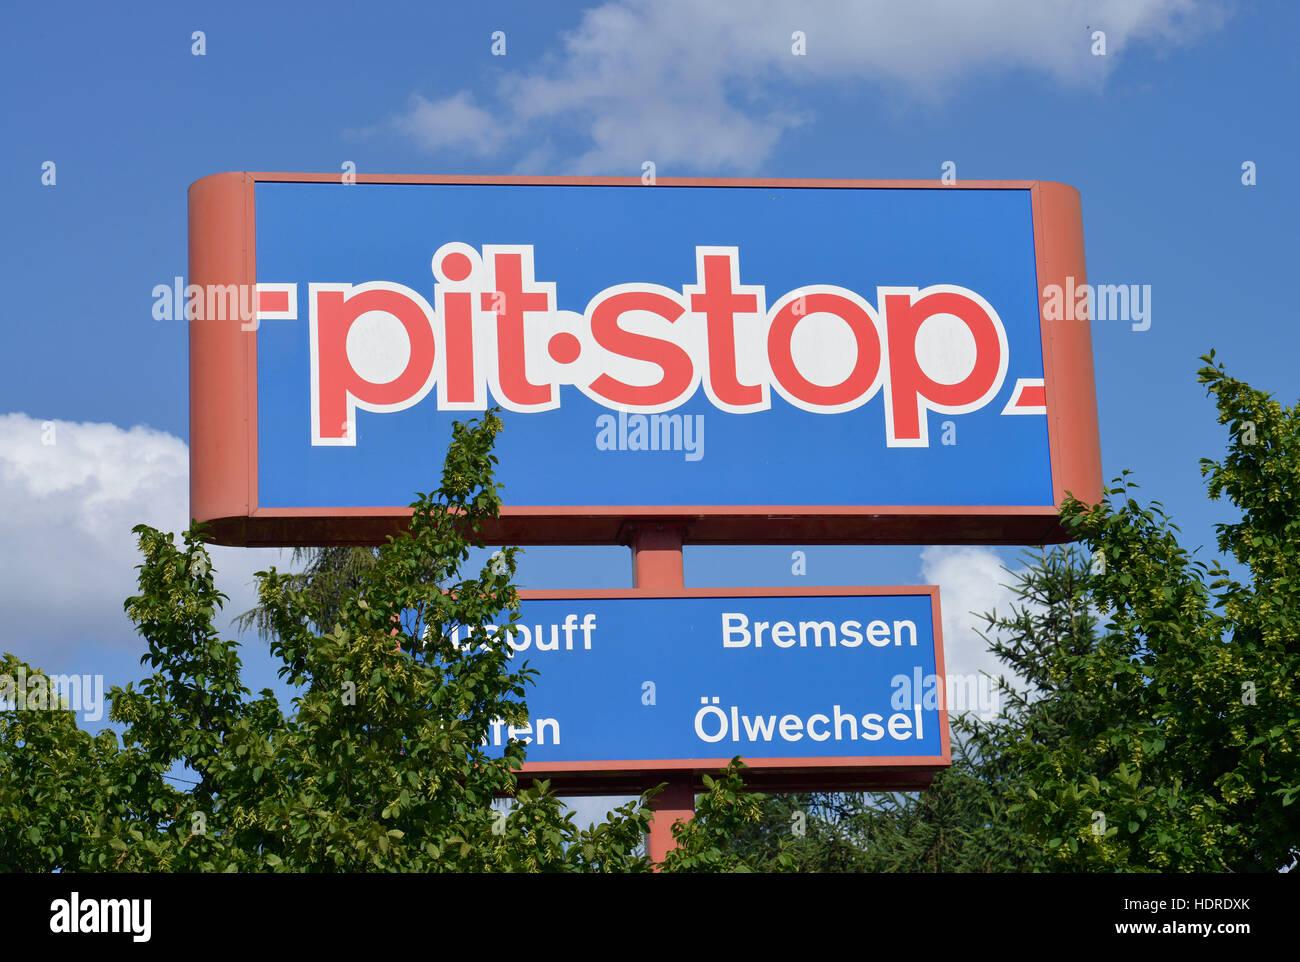 pit stop johannisthaler chaussee gropiusstadt neukoelln berlin stock photo 128978939 alamy. Black Bedroom Furniture Sets. Home Design Ideas